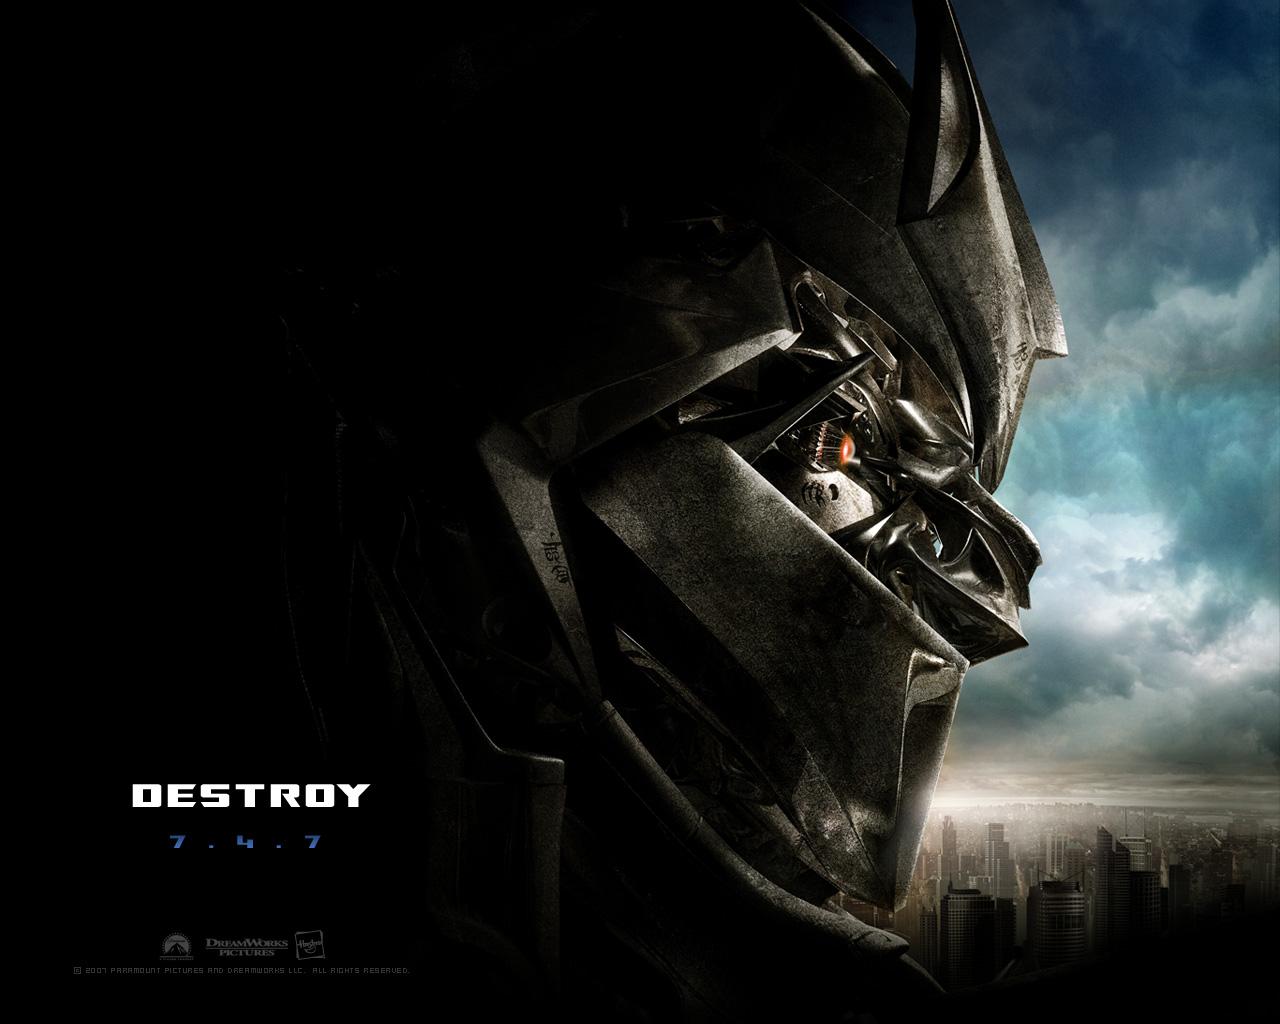 Transformers Movie Megatron   Transformers Wallpaper 35015 1280x1024